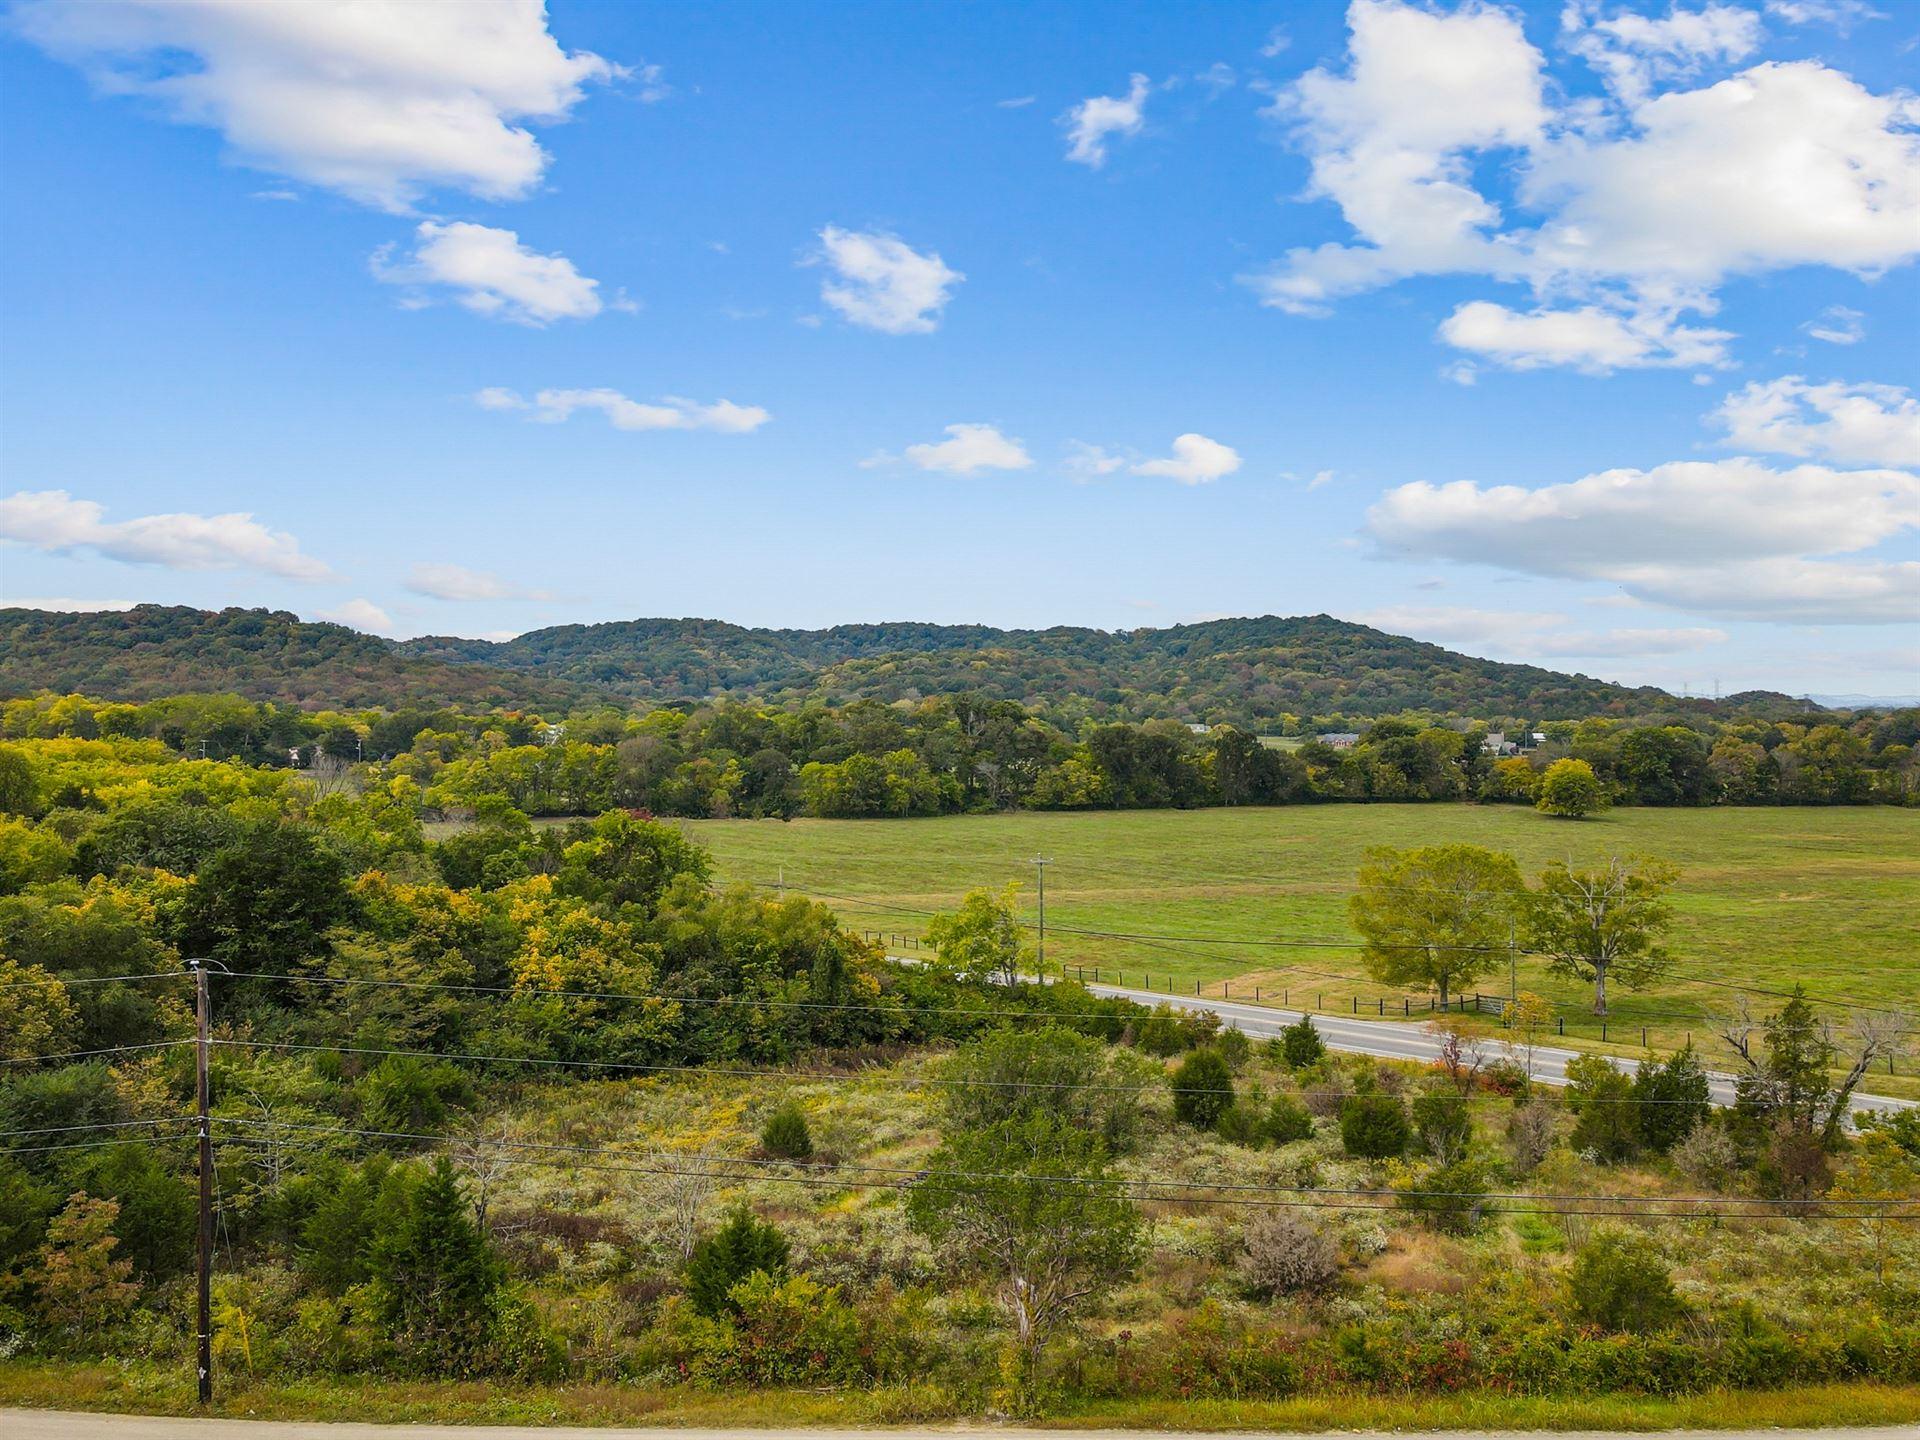 Photo of 440 Beech Creek Rd N, Brentwood, TN 37027 (MLS # 2166113)